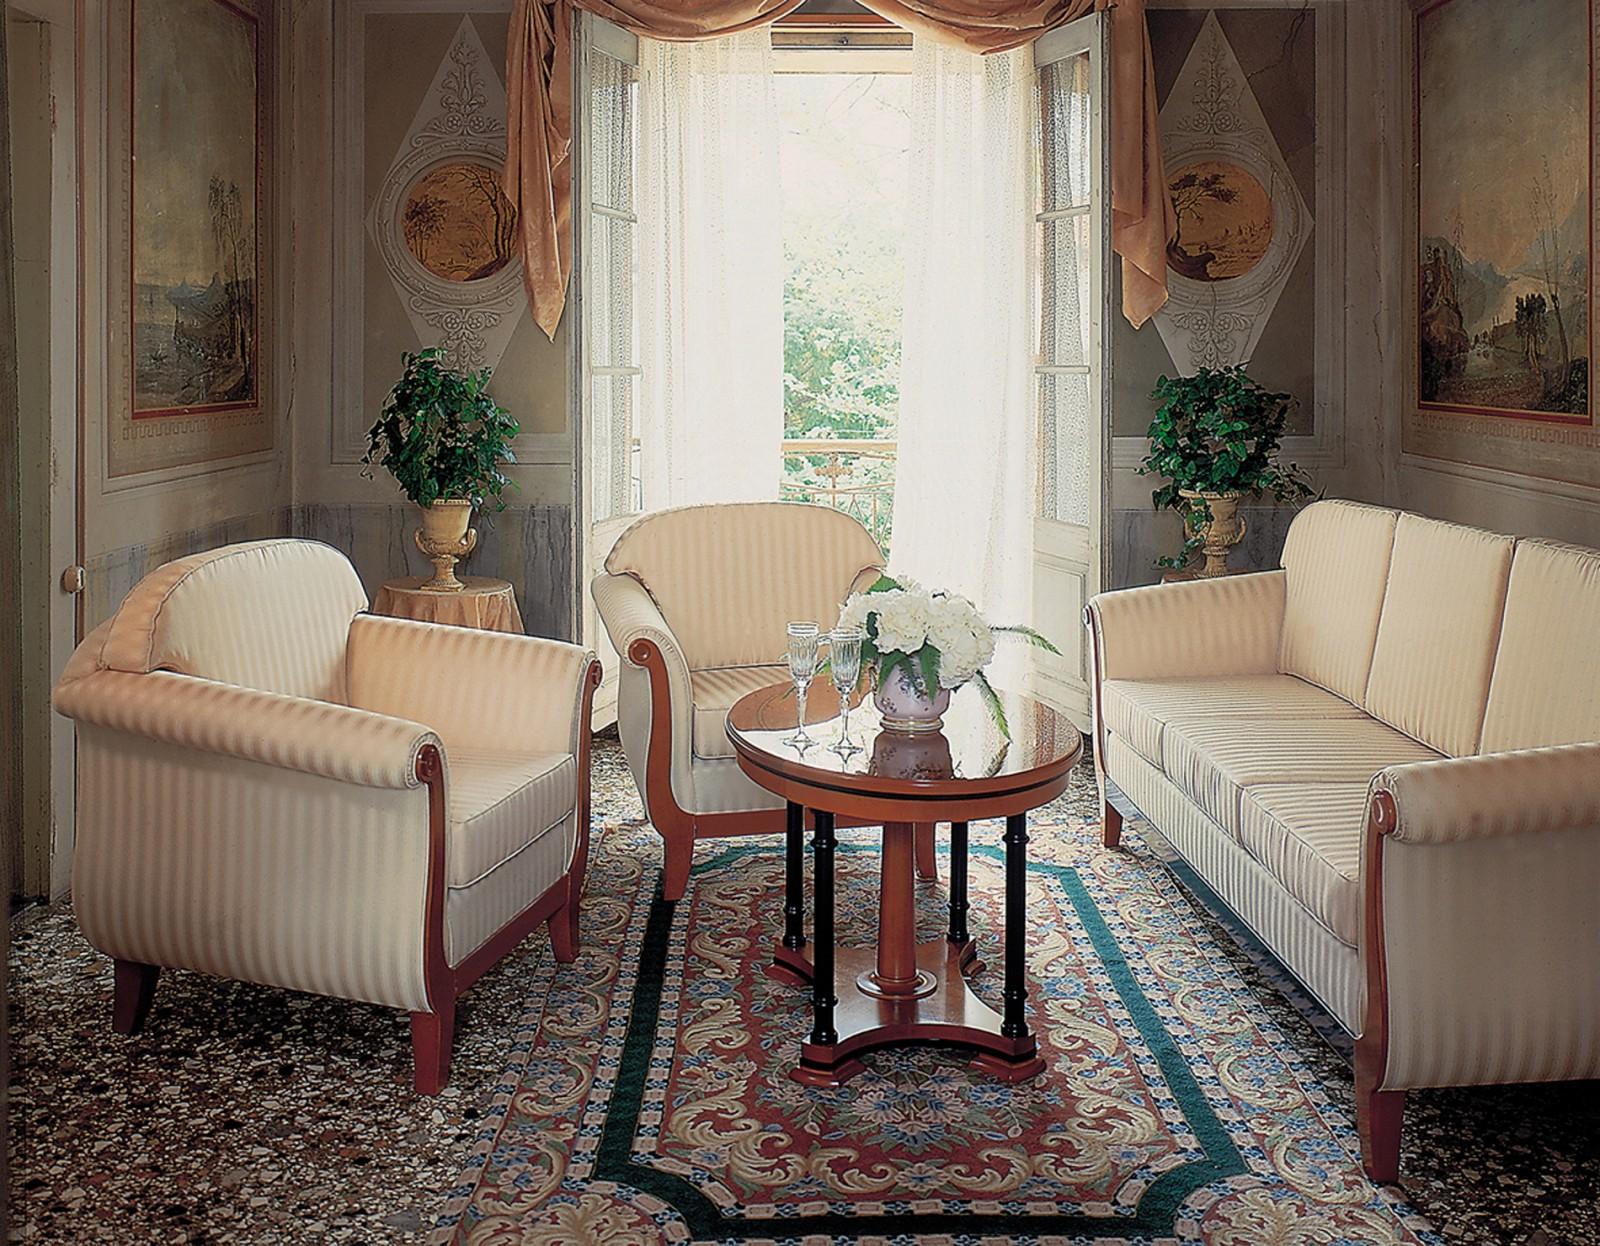 dnevna-soba_day-room_Wohnzimmer_Bidermajer_klasicno-pohistvo_classic-furniture_Klassischen-Moebel_Biedermeier_2